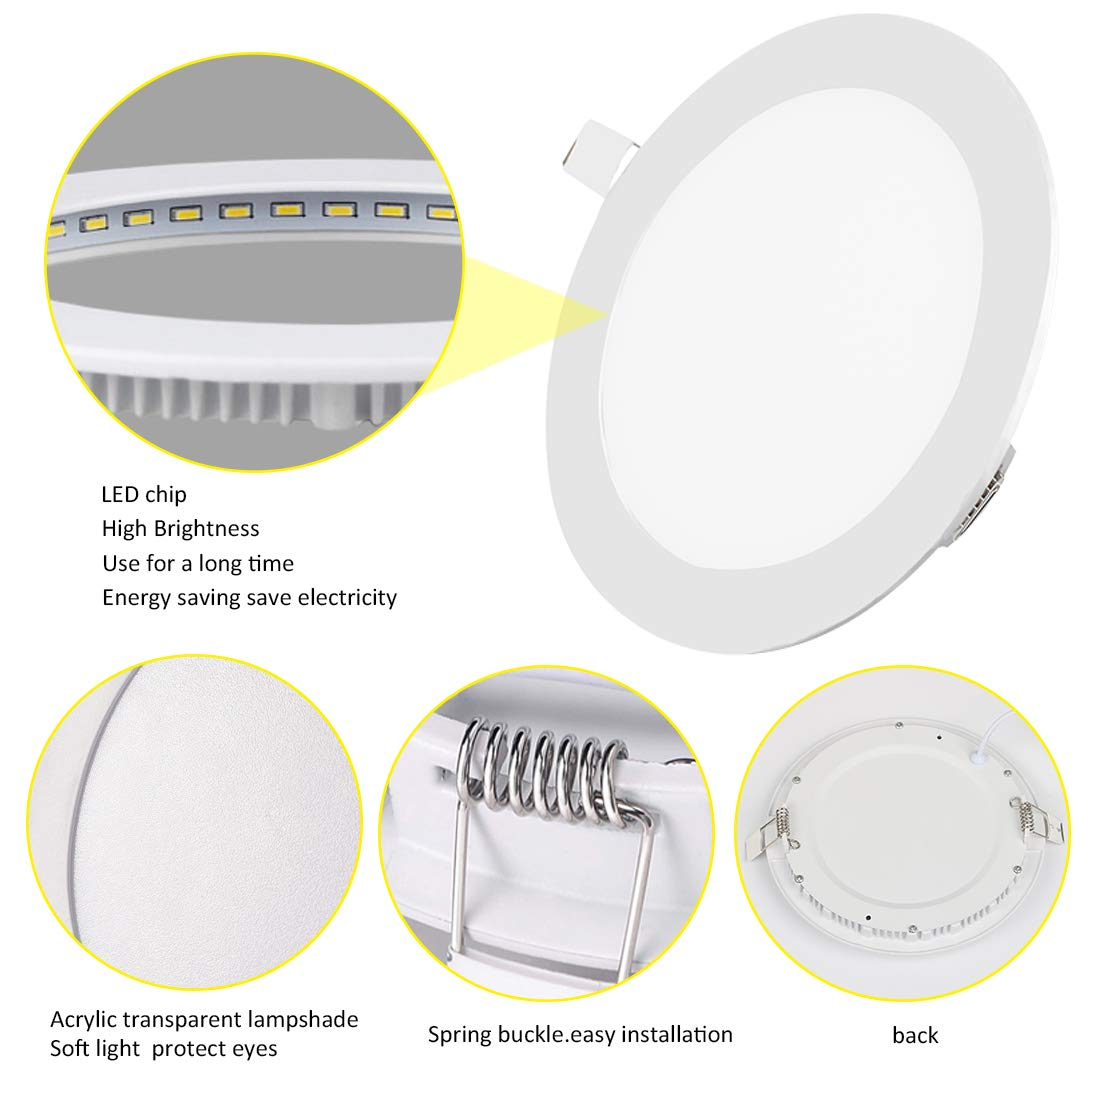 2 Pack LED Panel Light 4W 6500K Recessed Light Panel Round Ultra Slim Flat Panel Light Indoor Lighting for Home Living Room Bedroom Bathroom Office Corridor Hallways